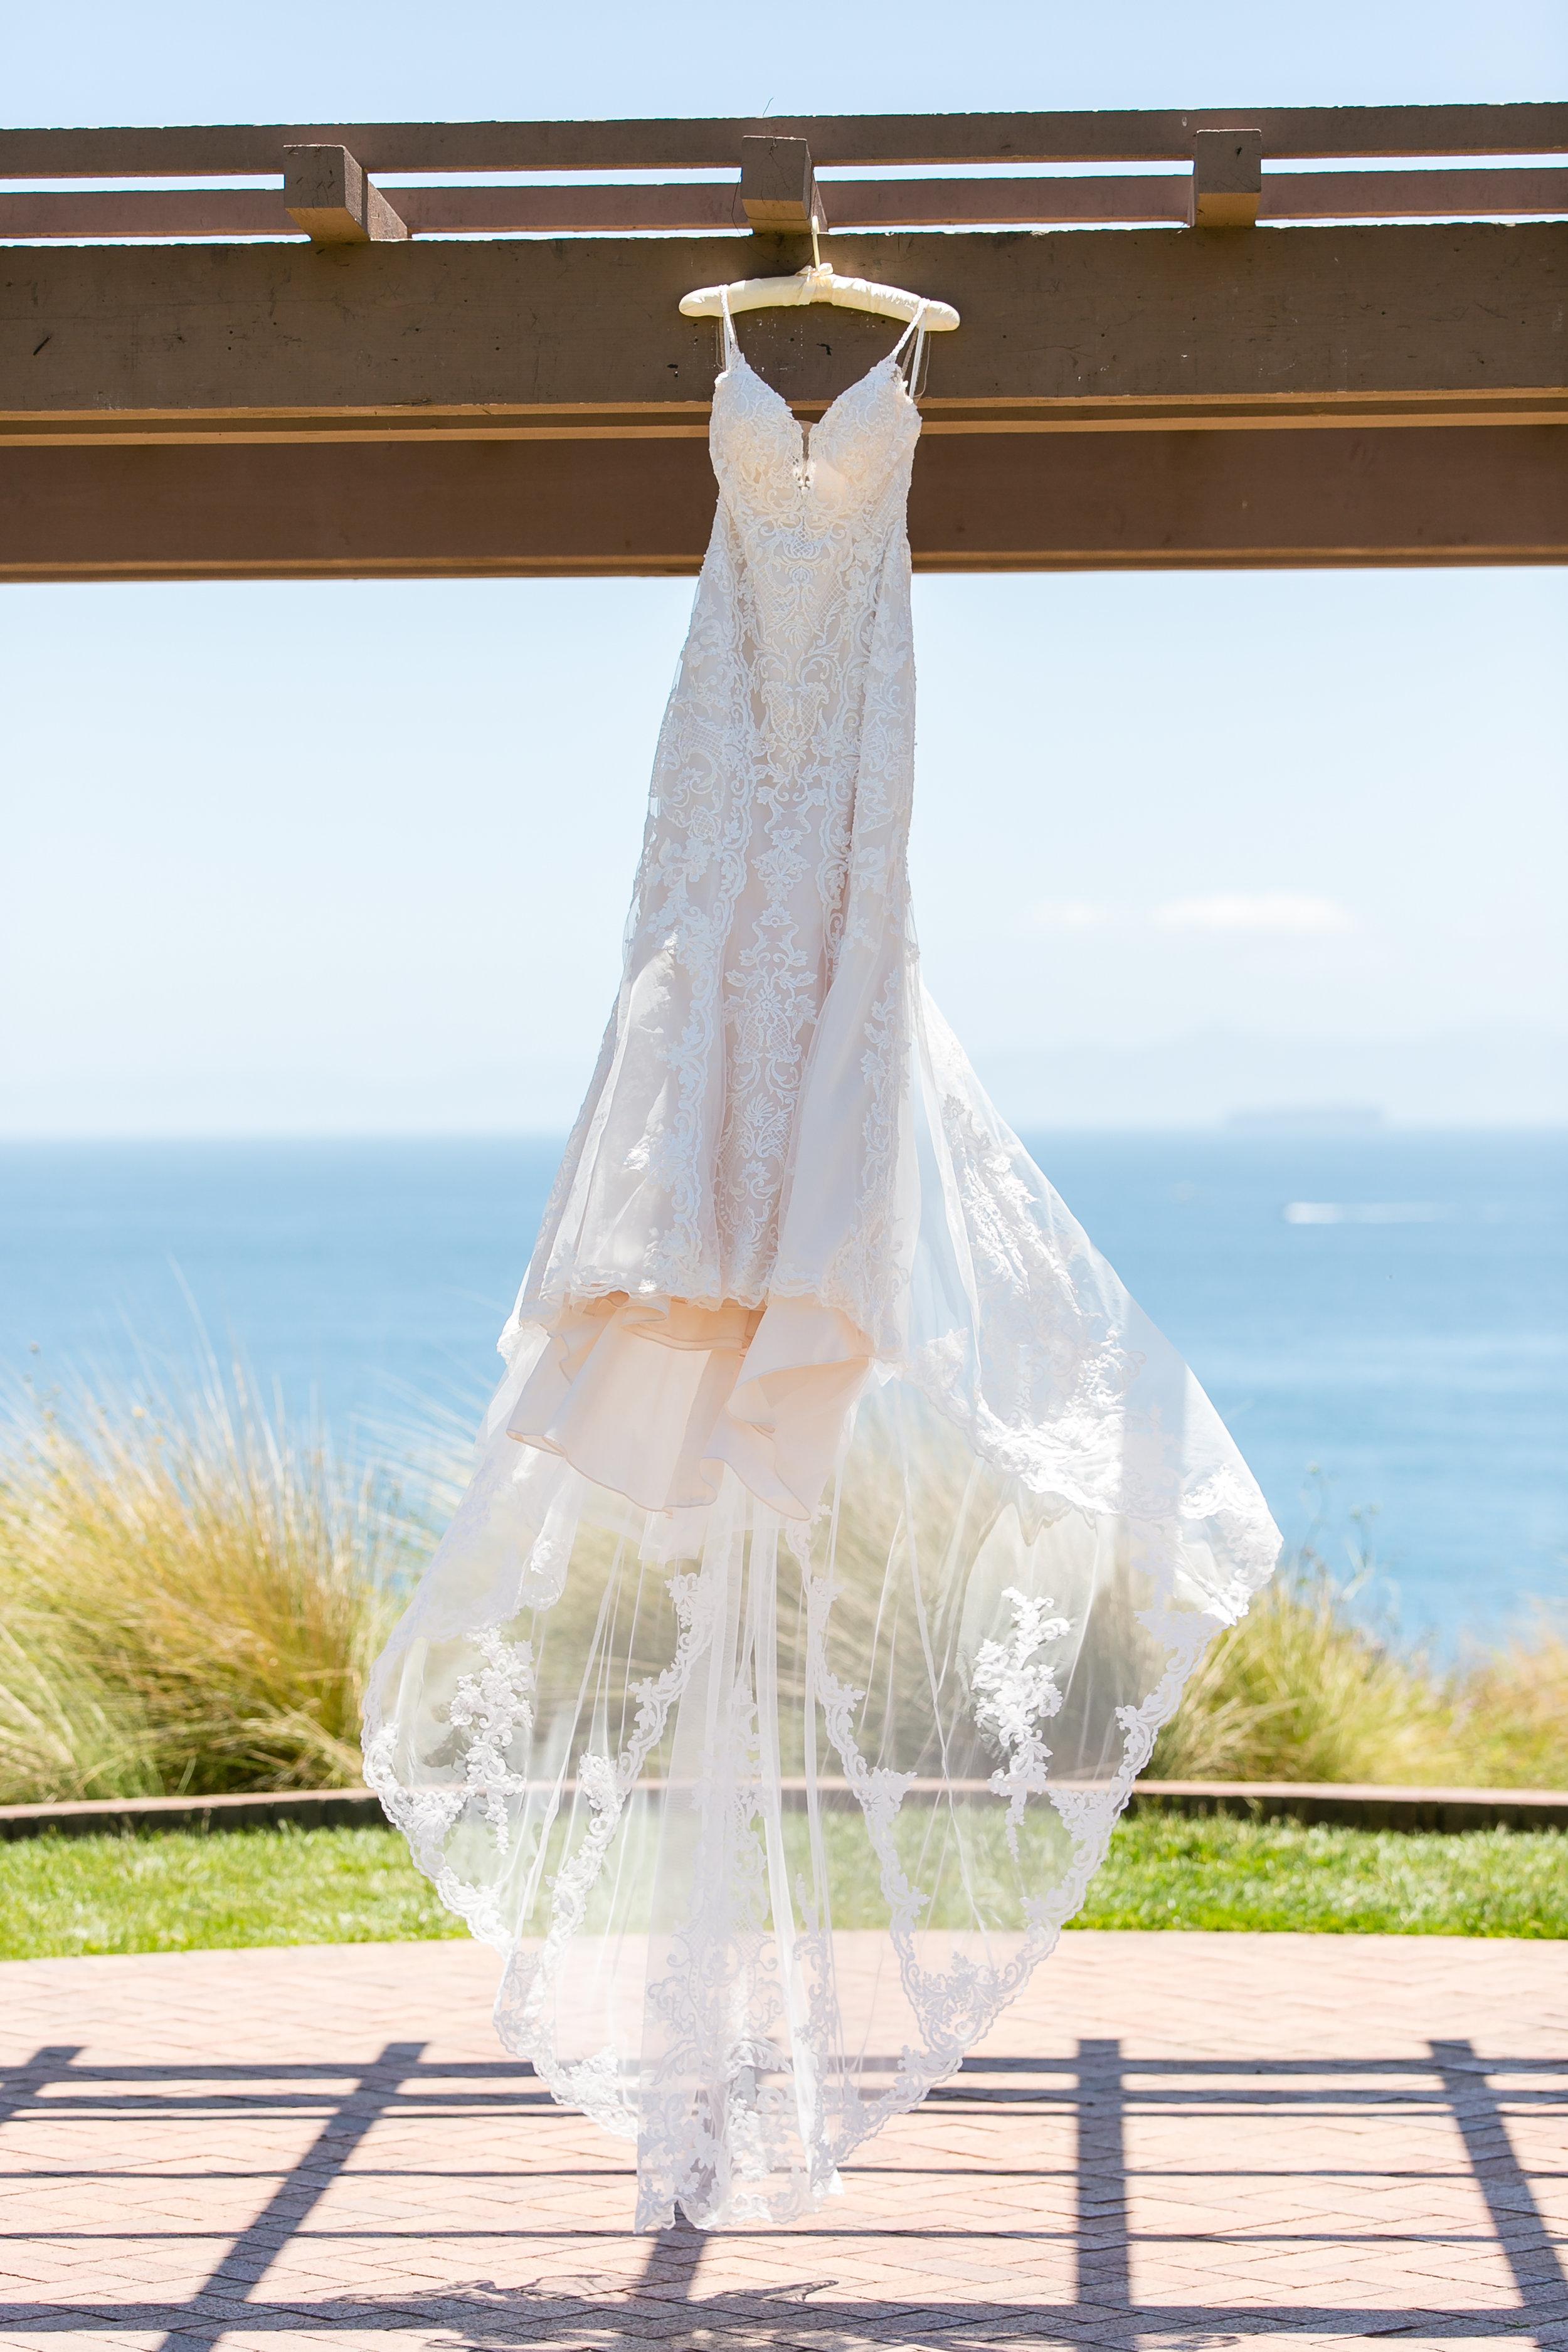 2019_05_24_Wedding_Barajas_0089.jpg